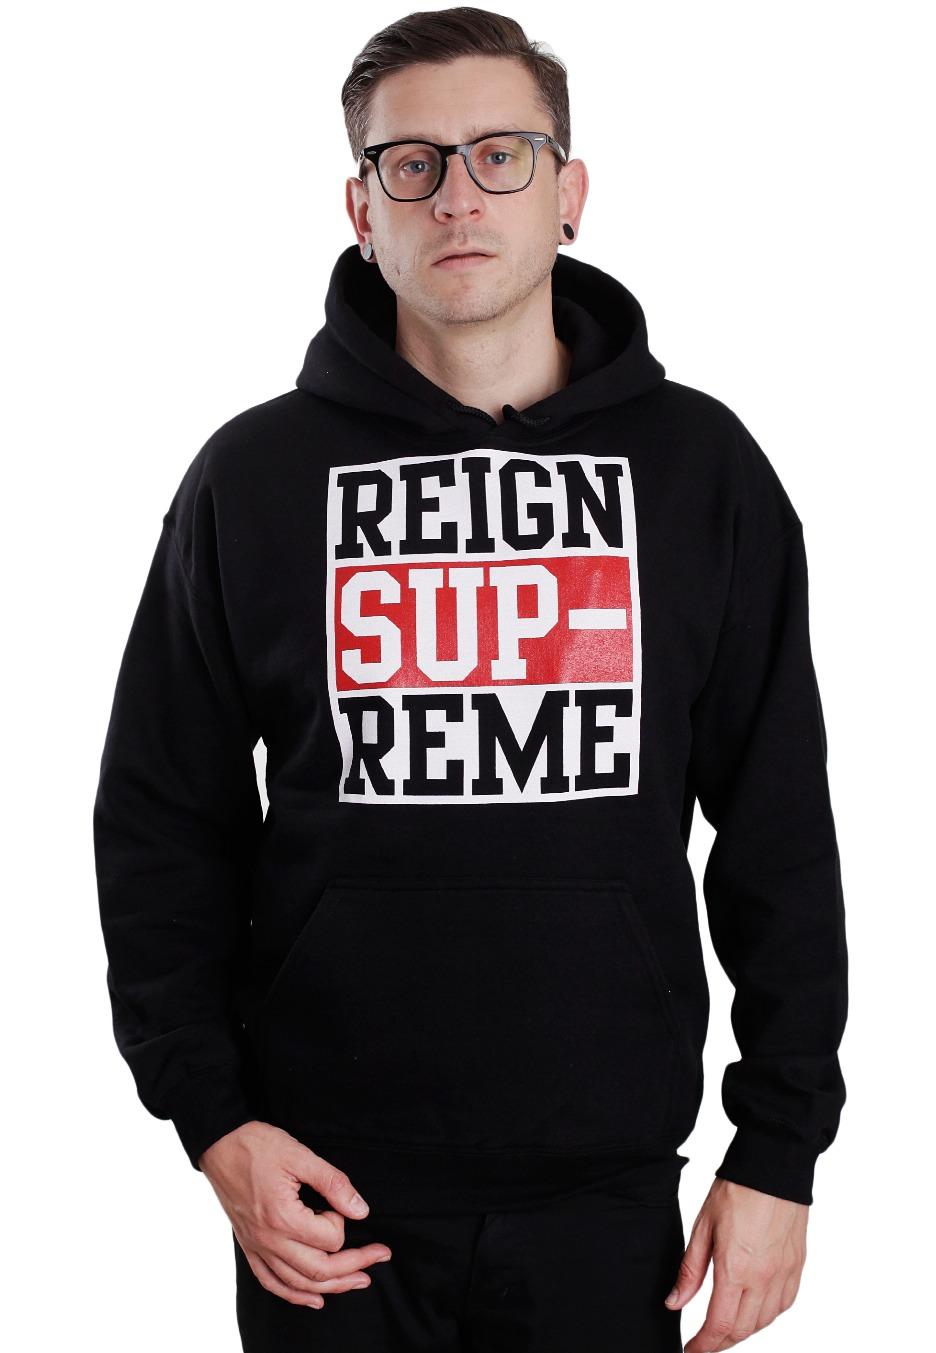 3cd794e5a673 Reign Supreme - Sticker - Hoodie - Impericon.com UK